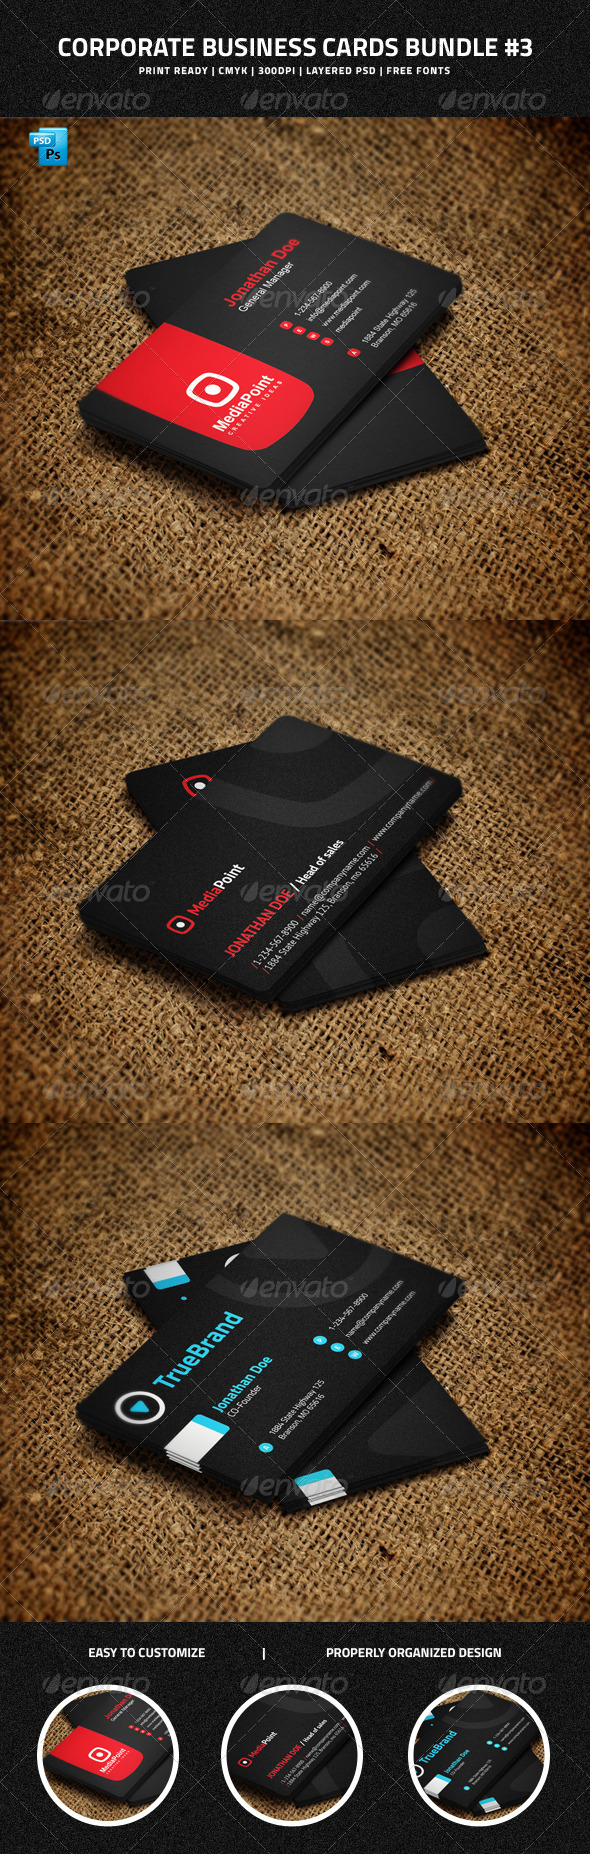 Corporate Business Cards Bundle #3 - Corporate Business Cards